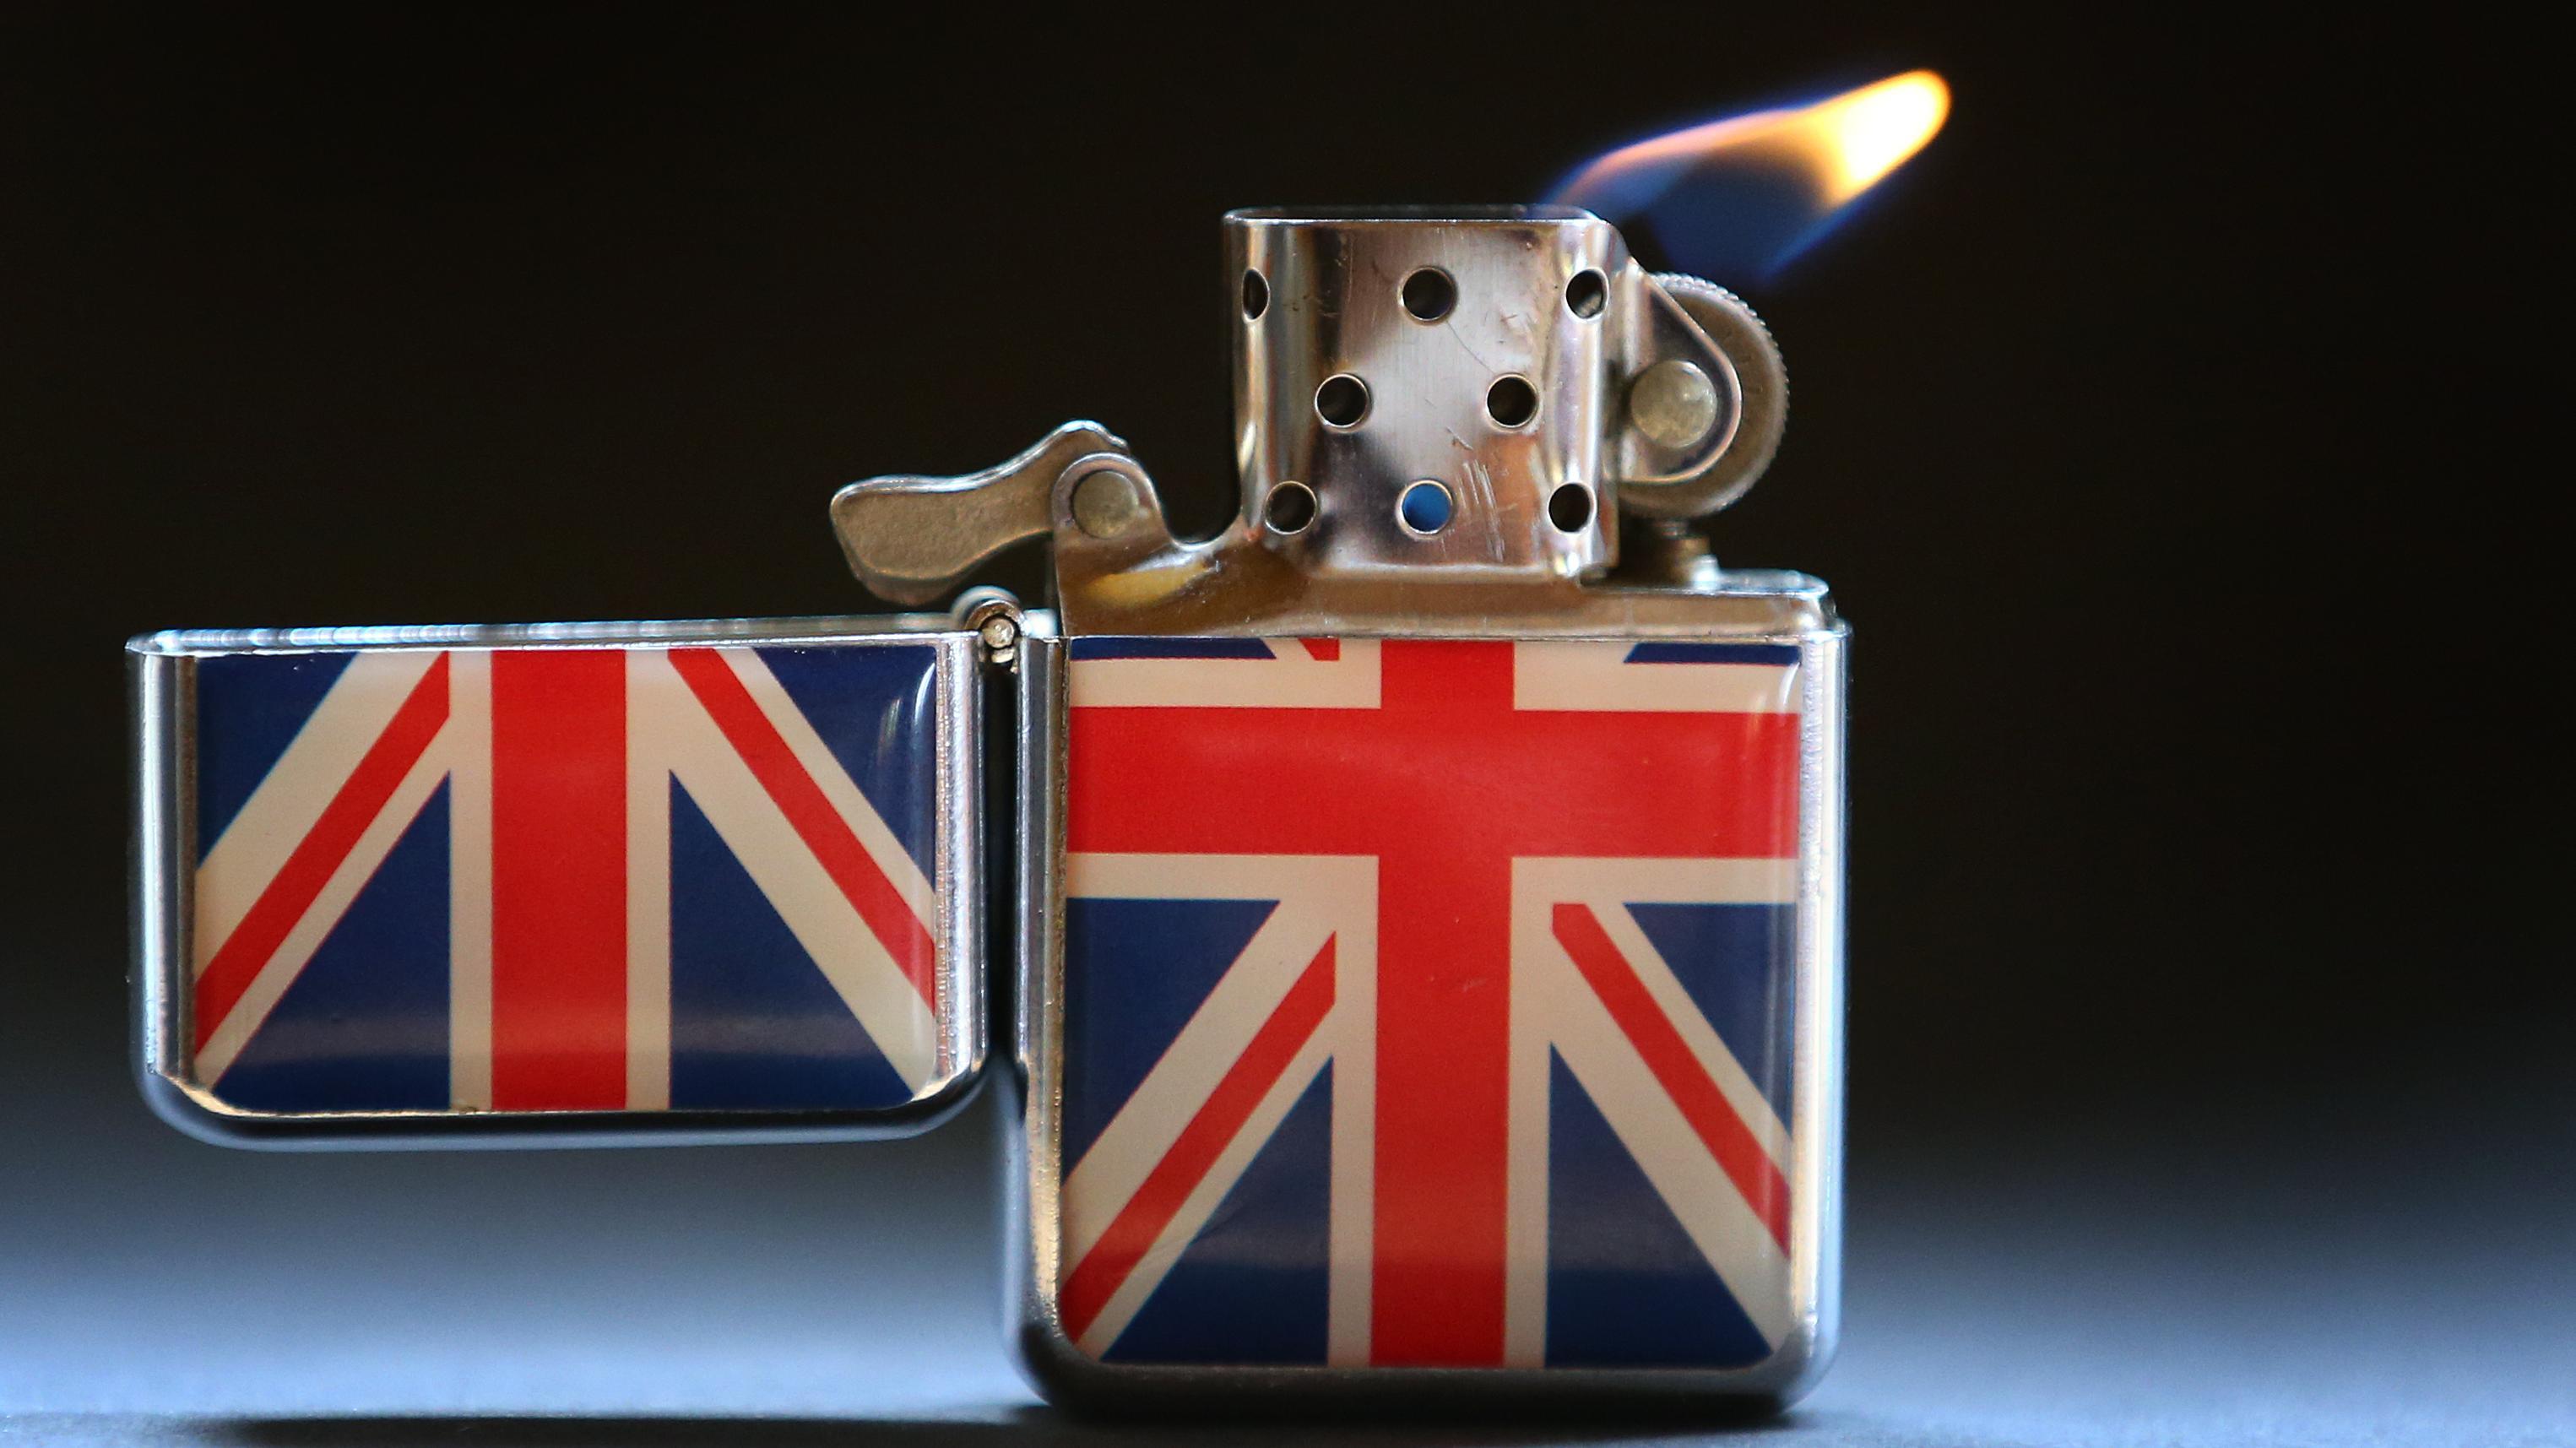 Symbolbild: Feuerzeug mit Union Jack